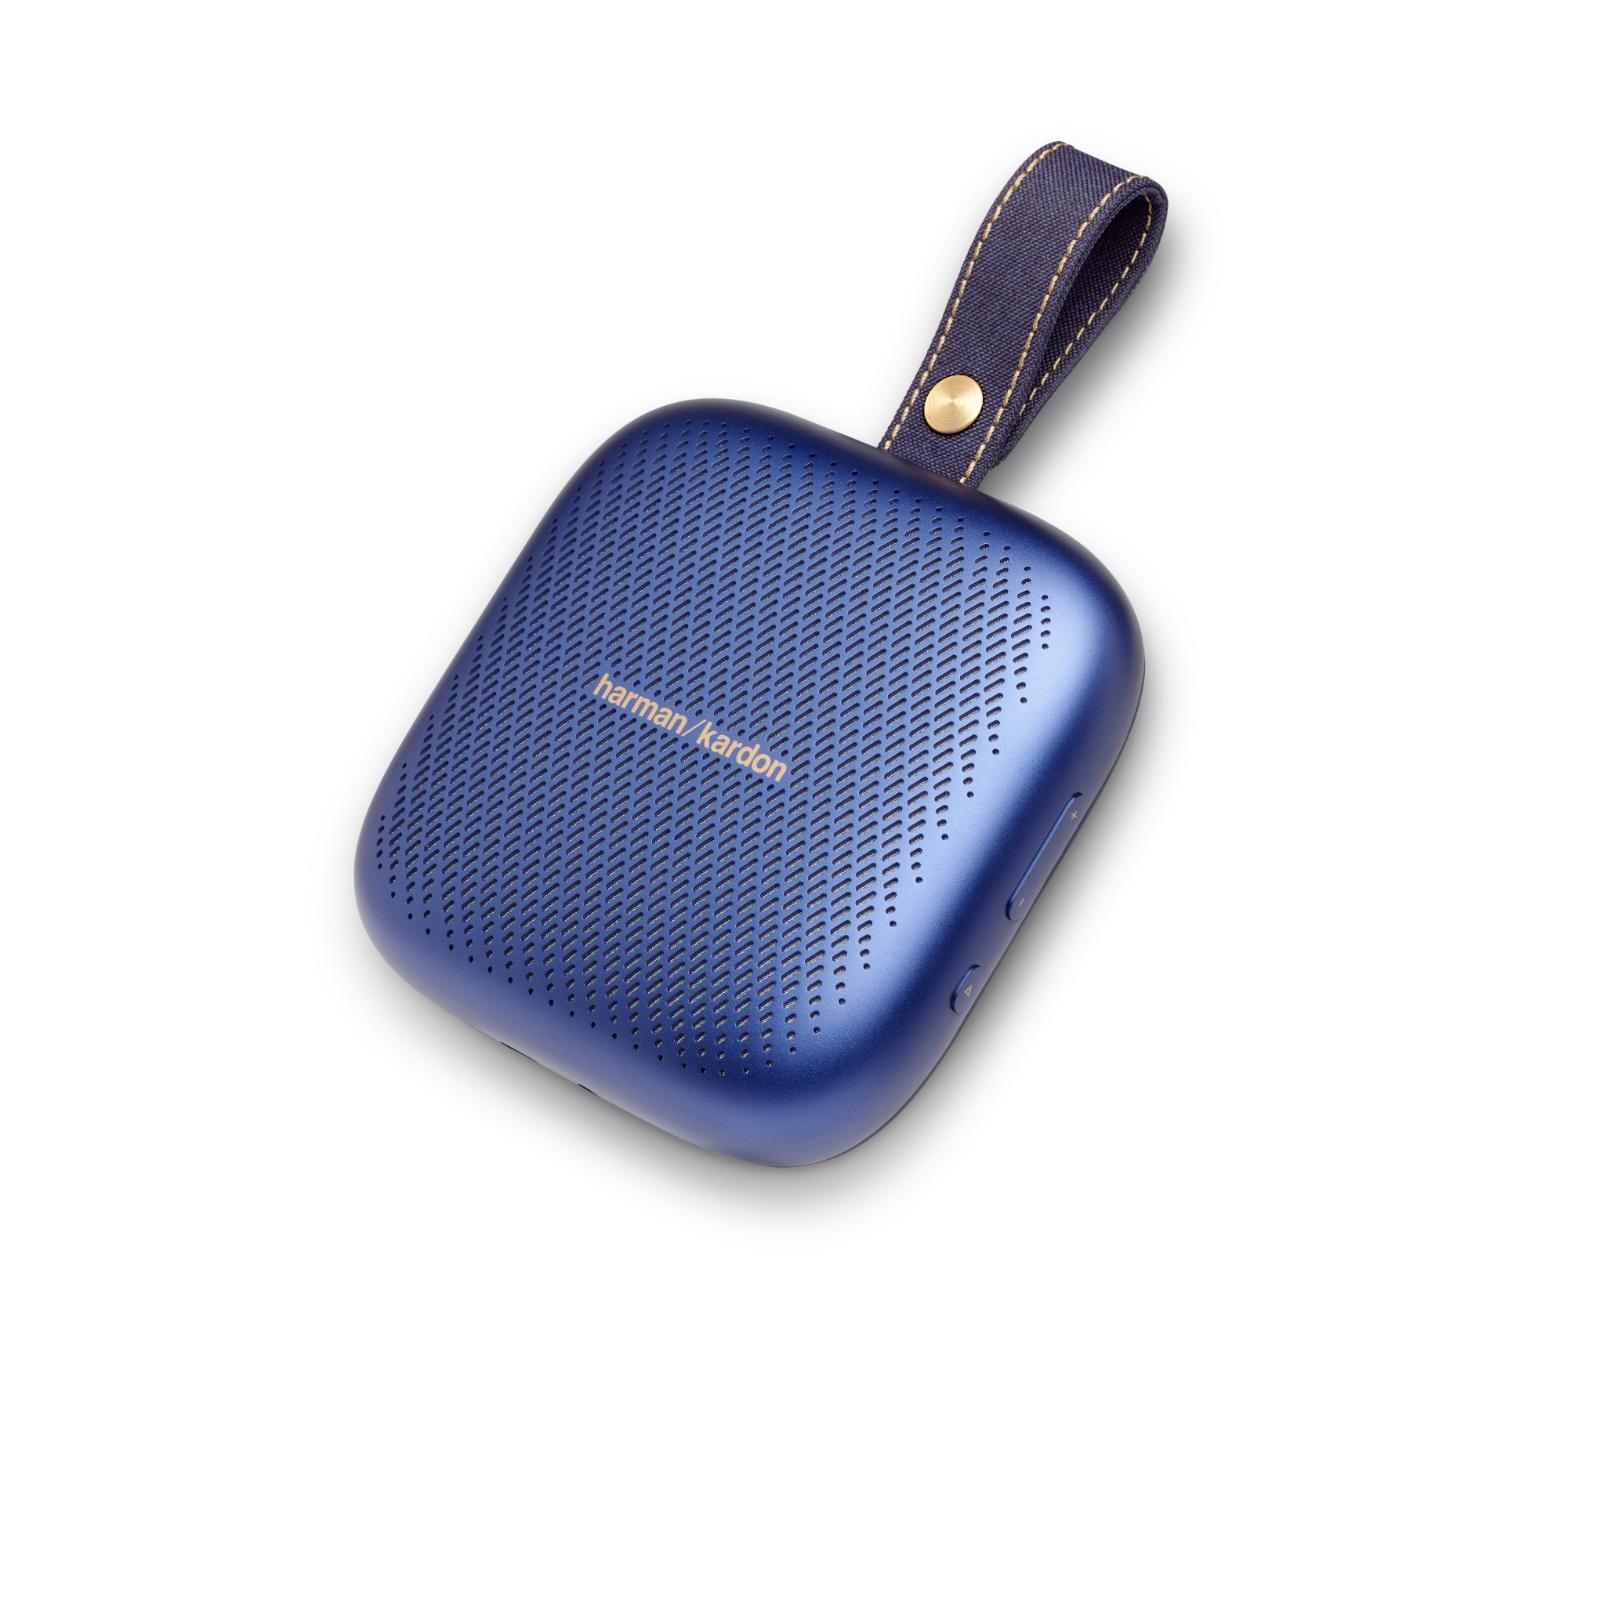 Harman Kardon Neo - Midnight Blue - Portable Bluetooth speaker - Hero